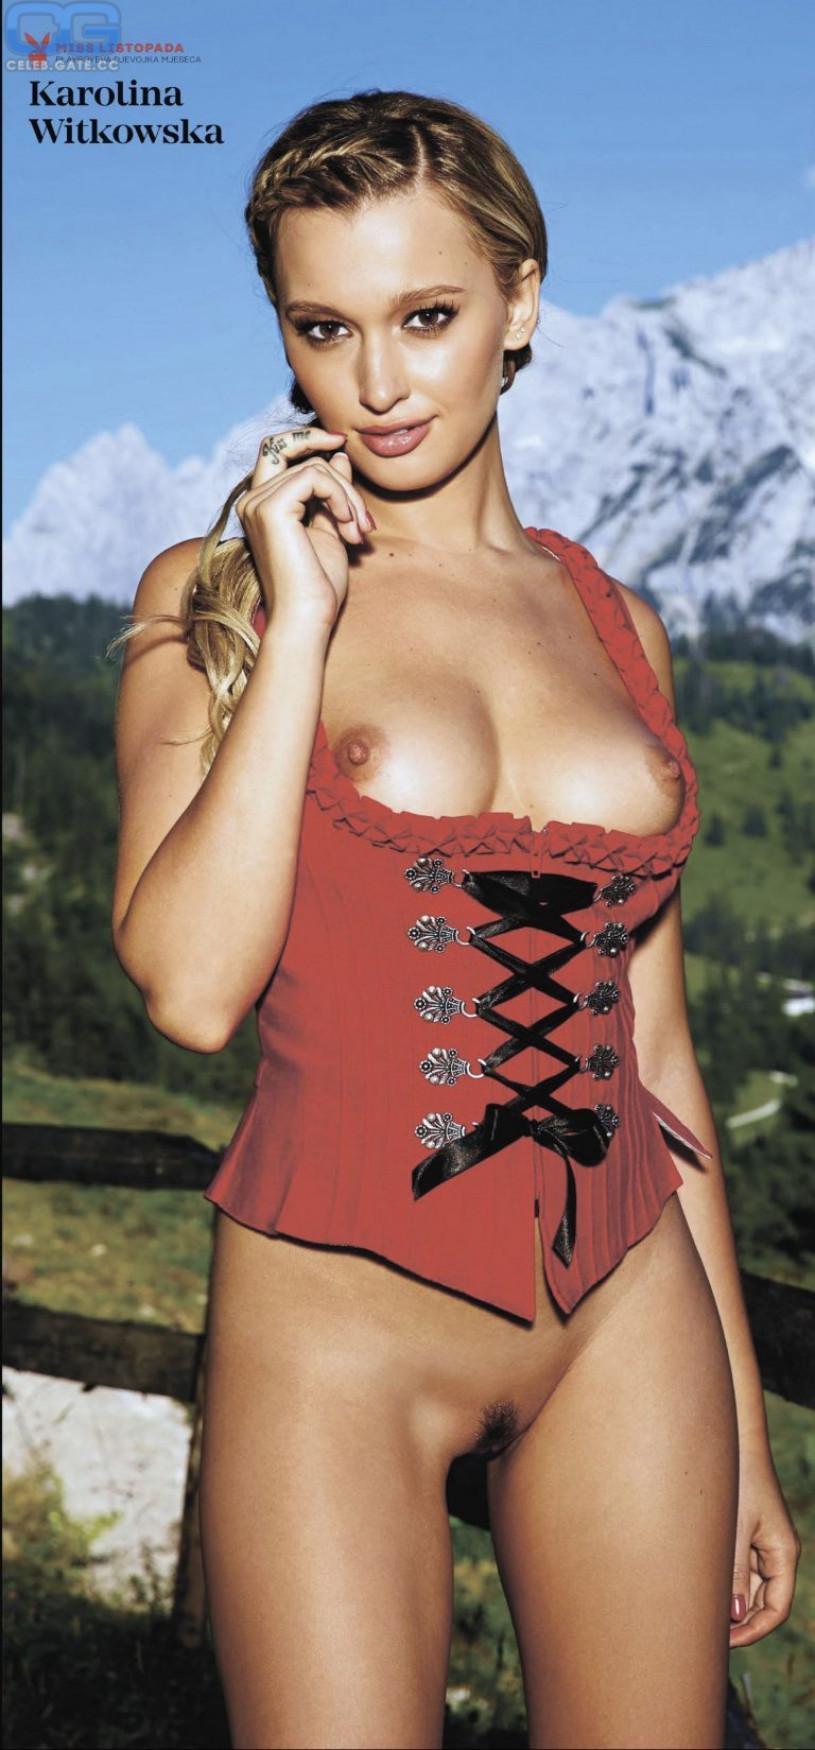 Karolina Witkowska nackt